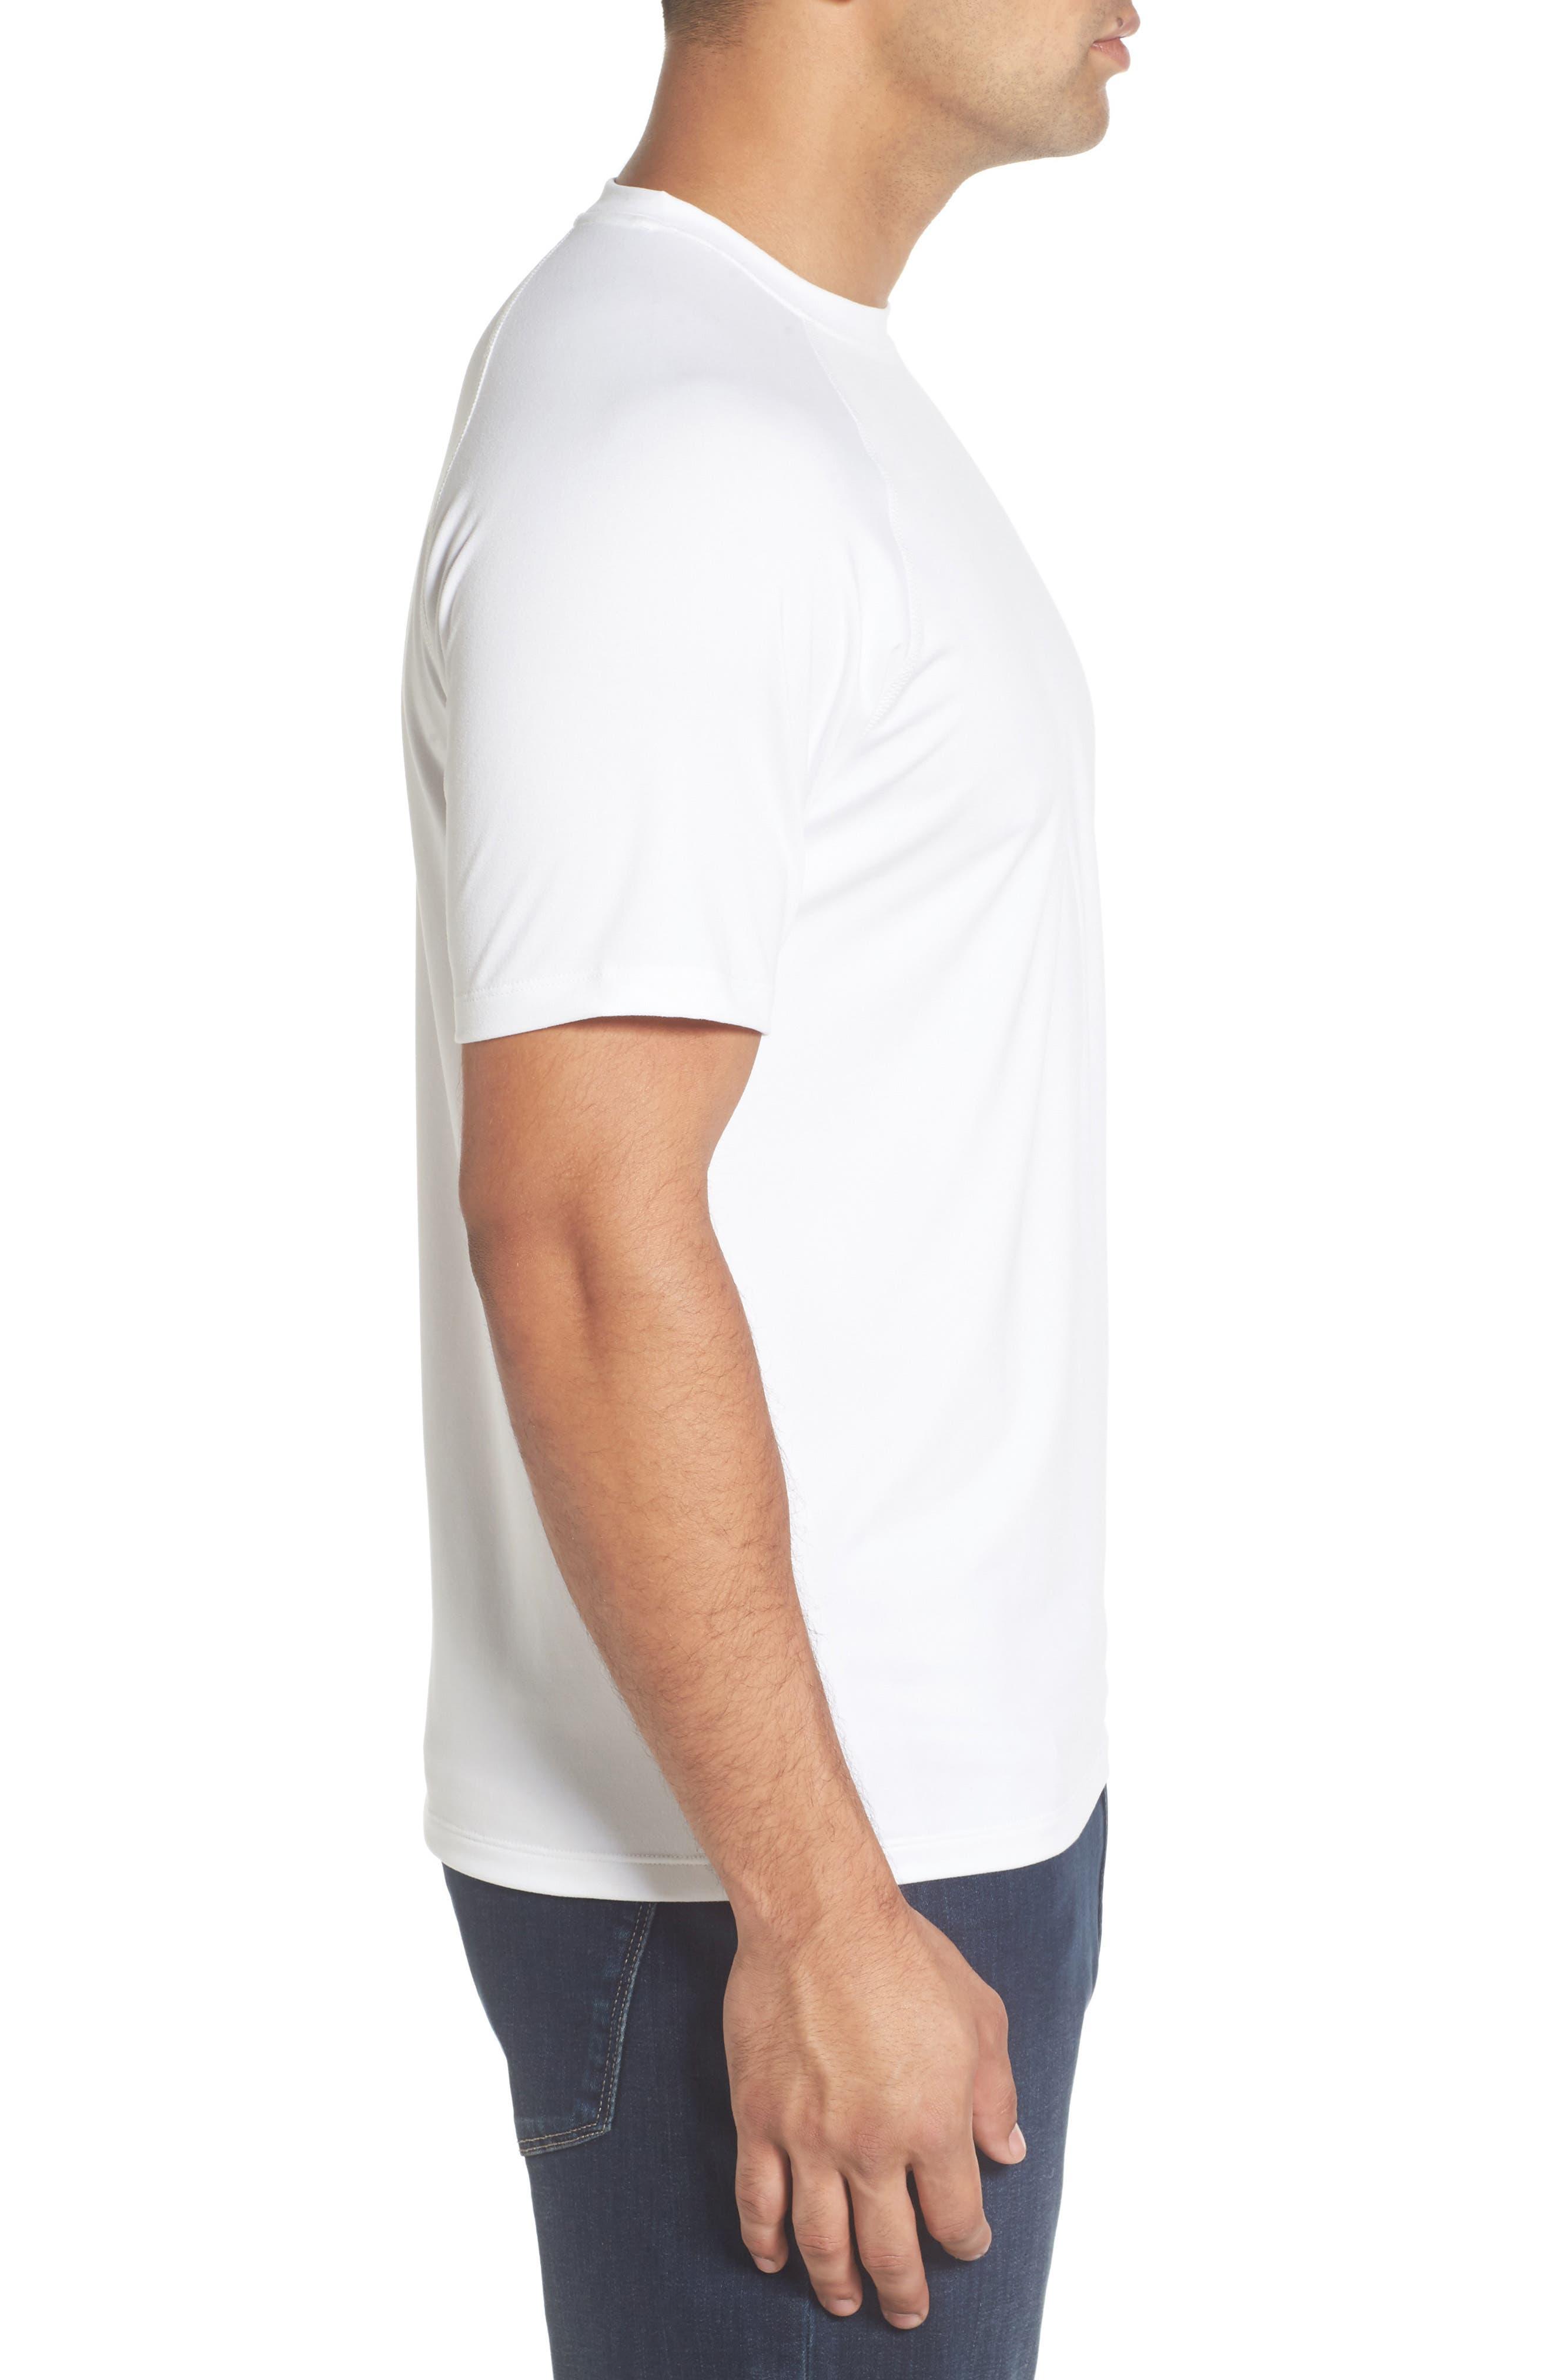 Rio Technical T-Shirt,                             Alternate thumbnail 3, color,                             White